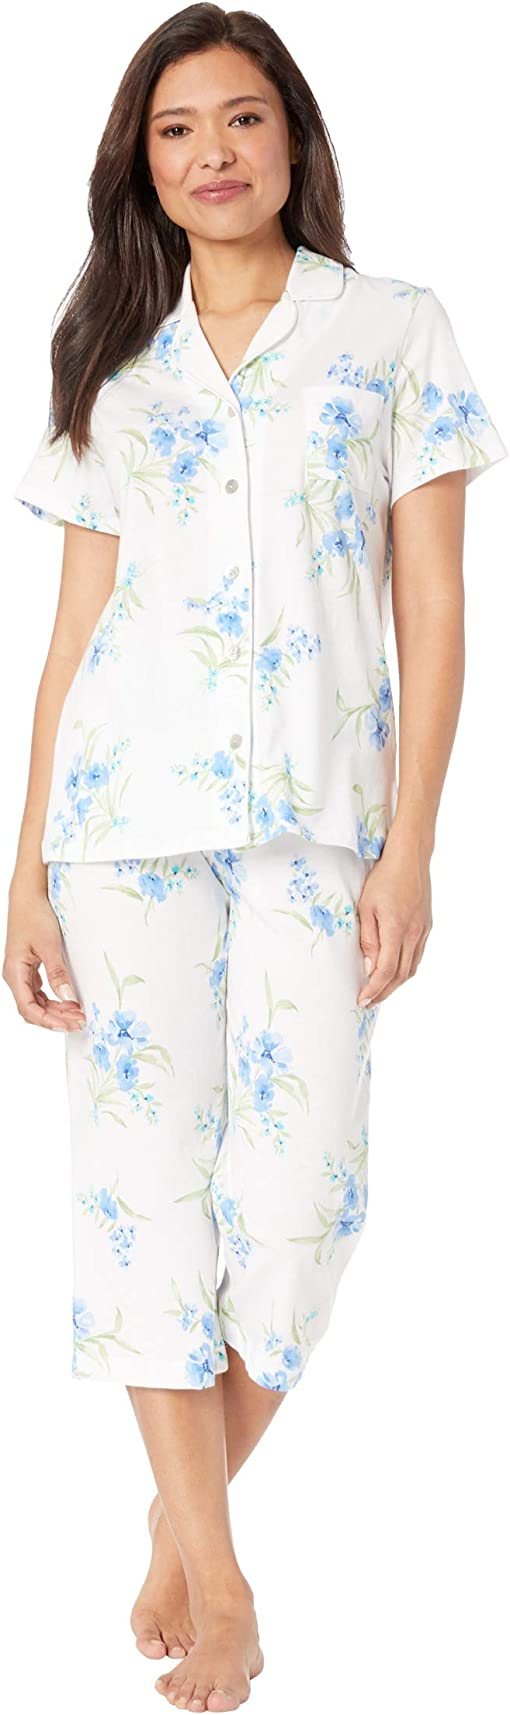 White/Aqua Floral